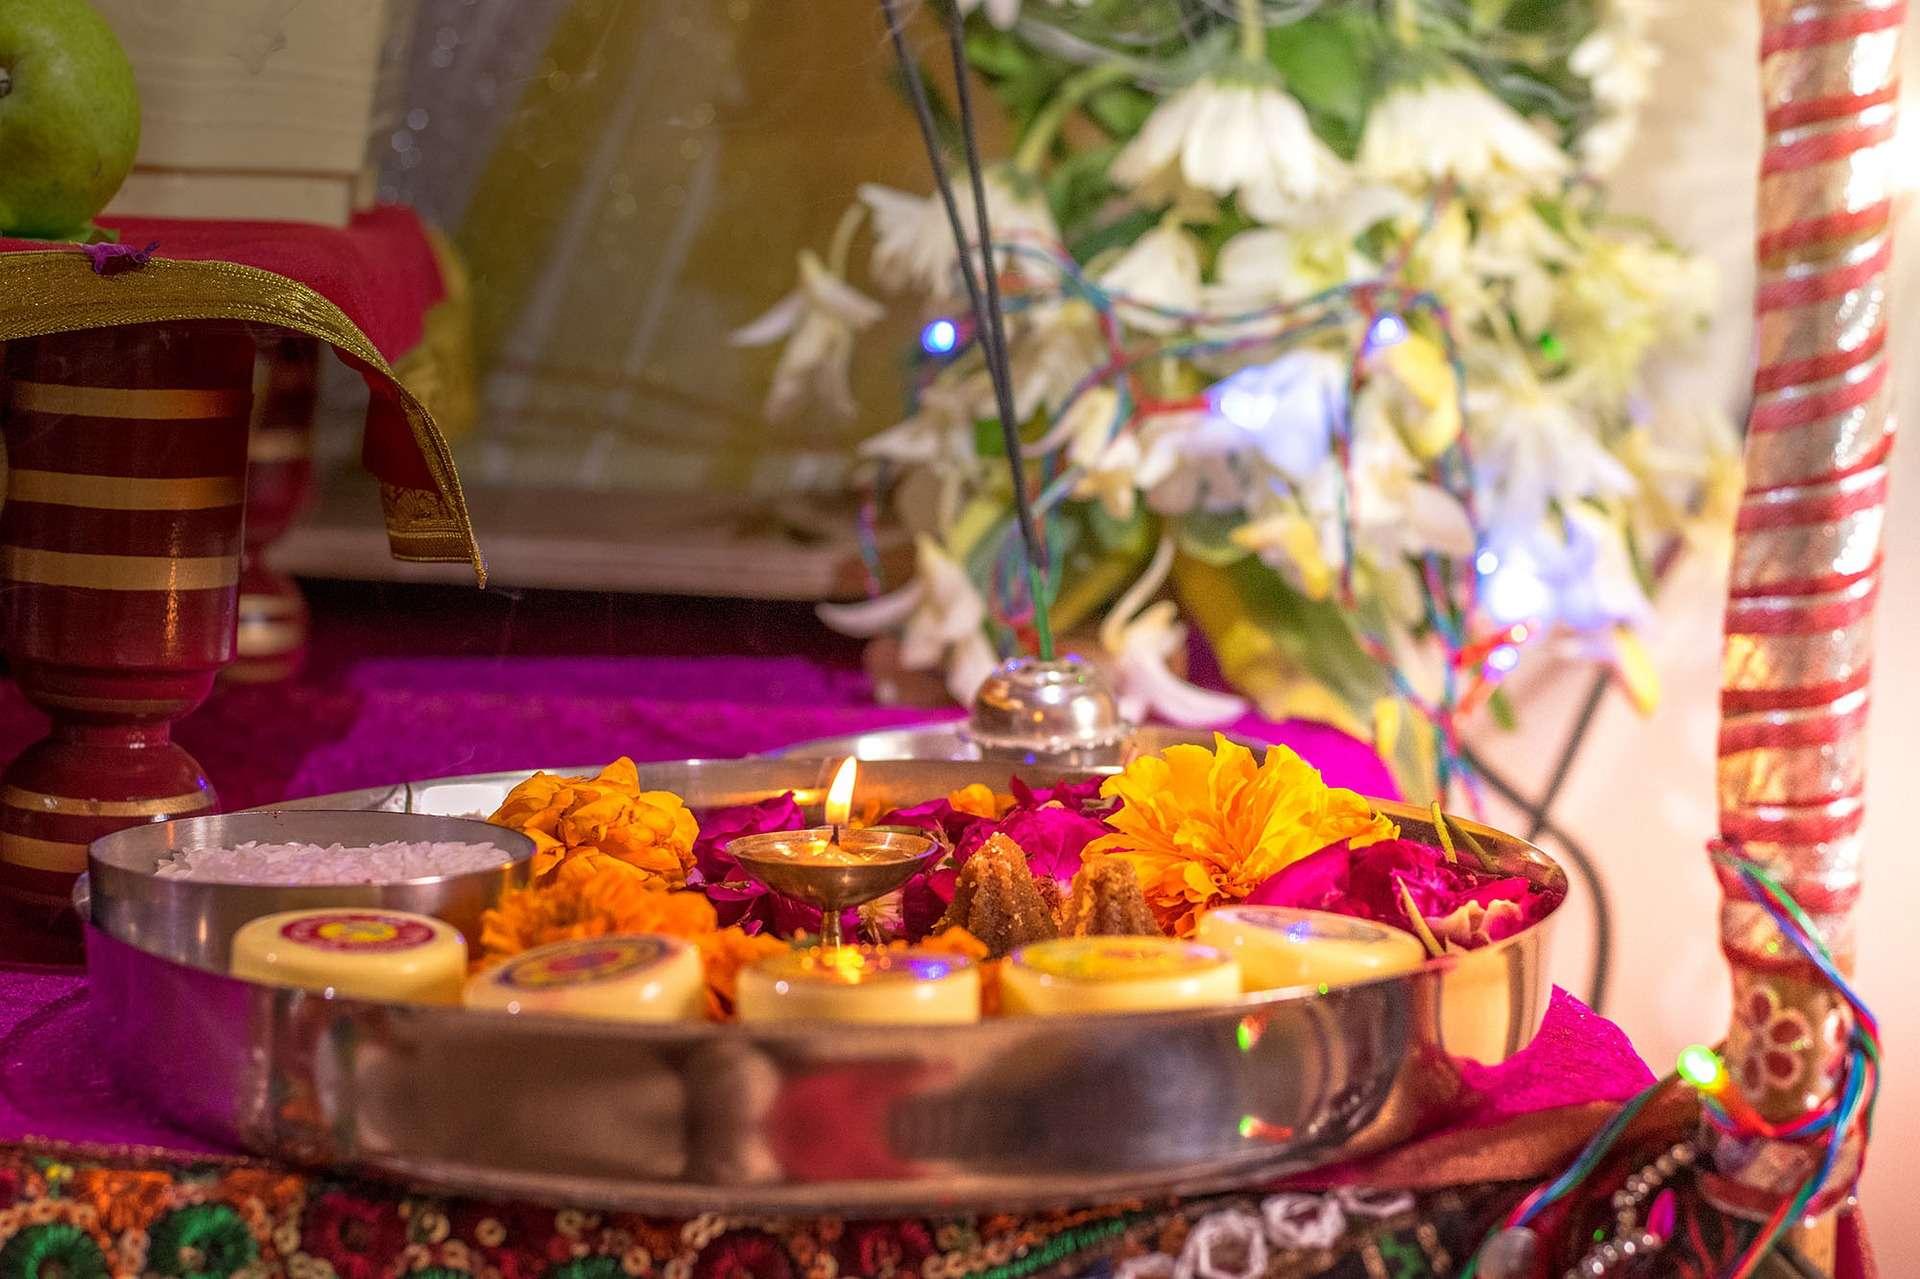 Pitru Paksha 2019 begins; check important dates, significance & shradh rituals